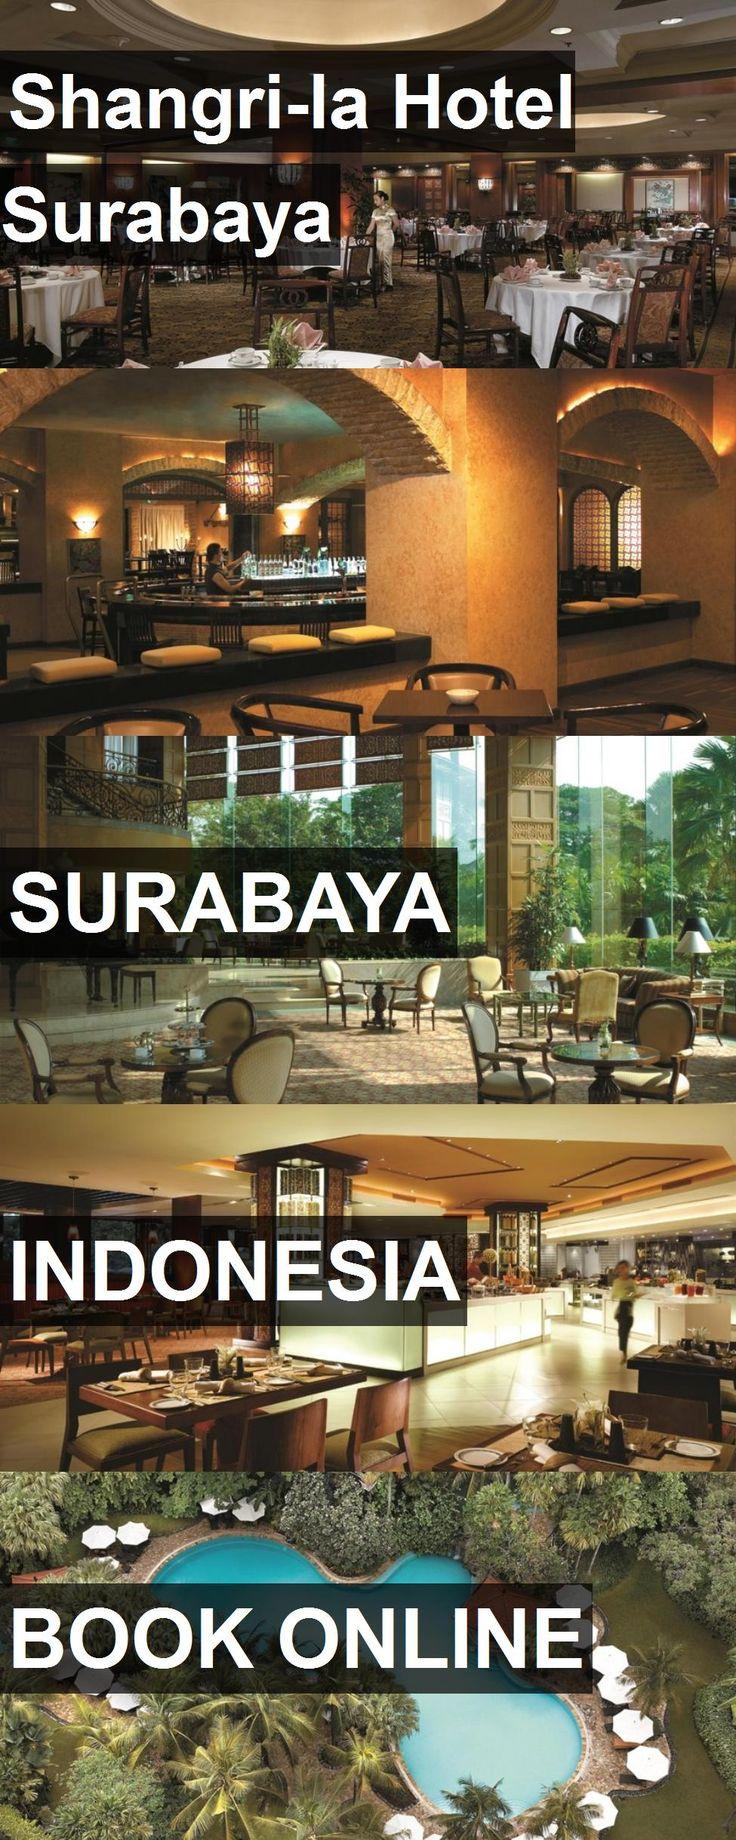 Hotel Shangri La Surabaya In Indonesia For More Information Photos